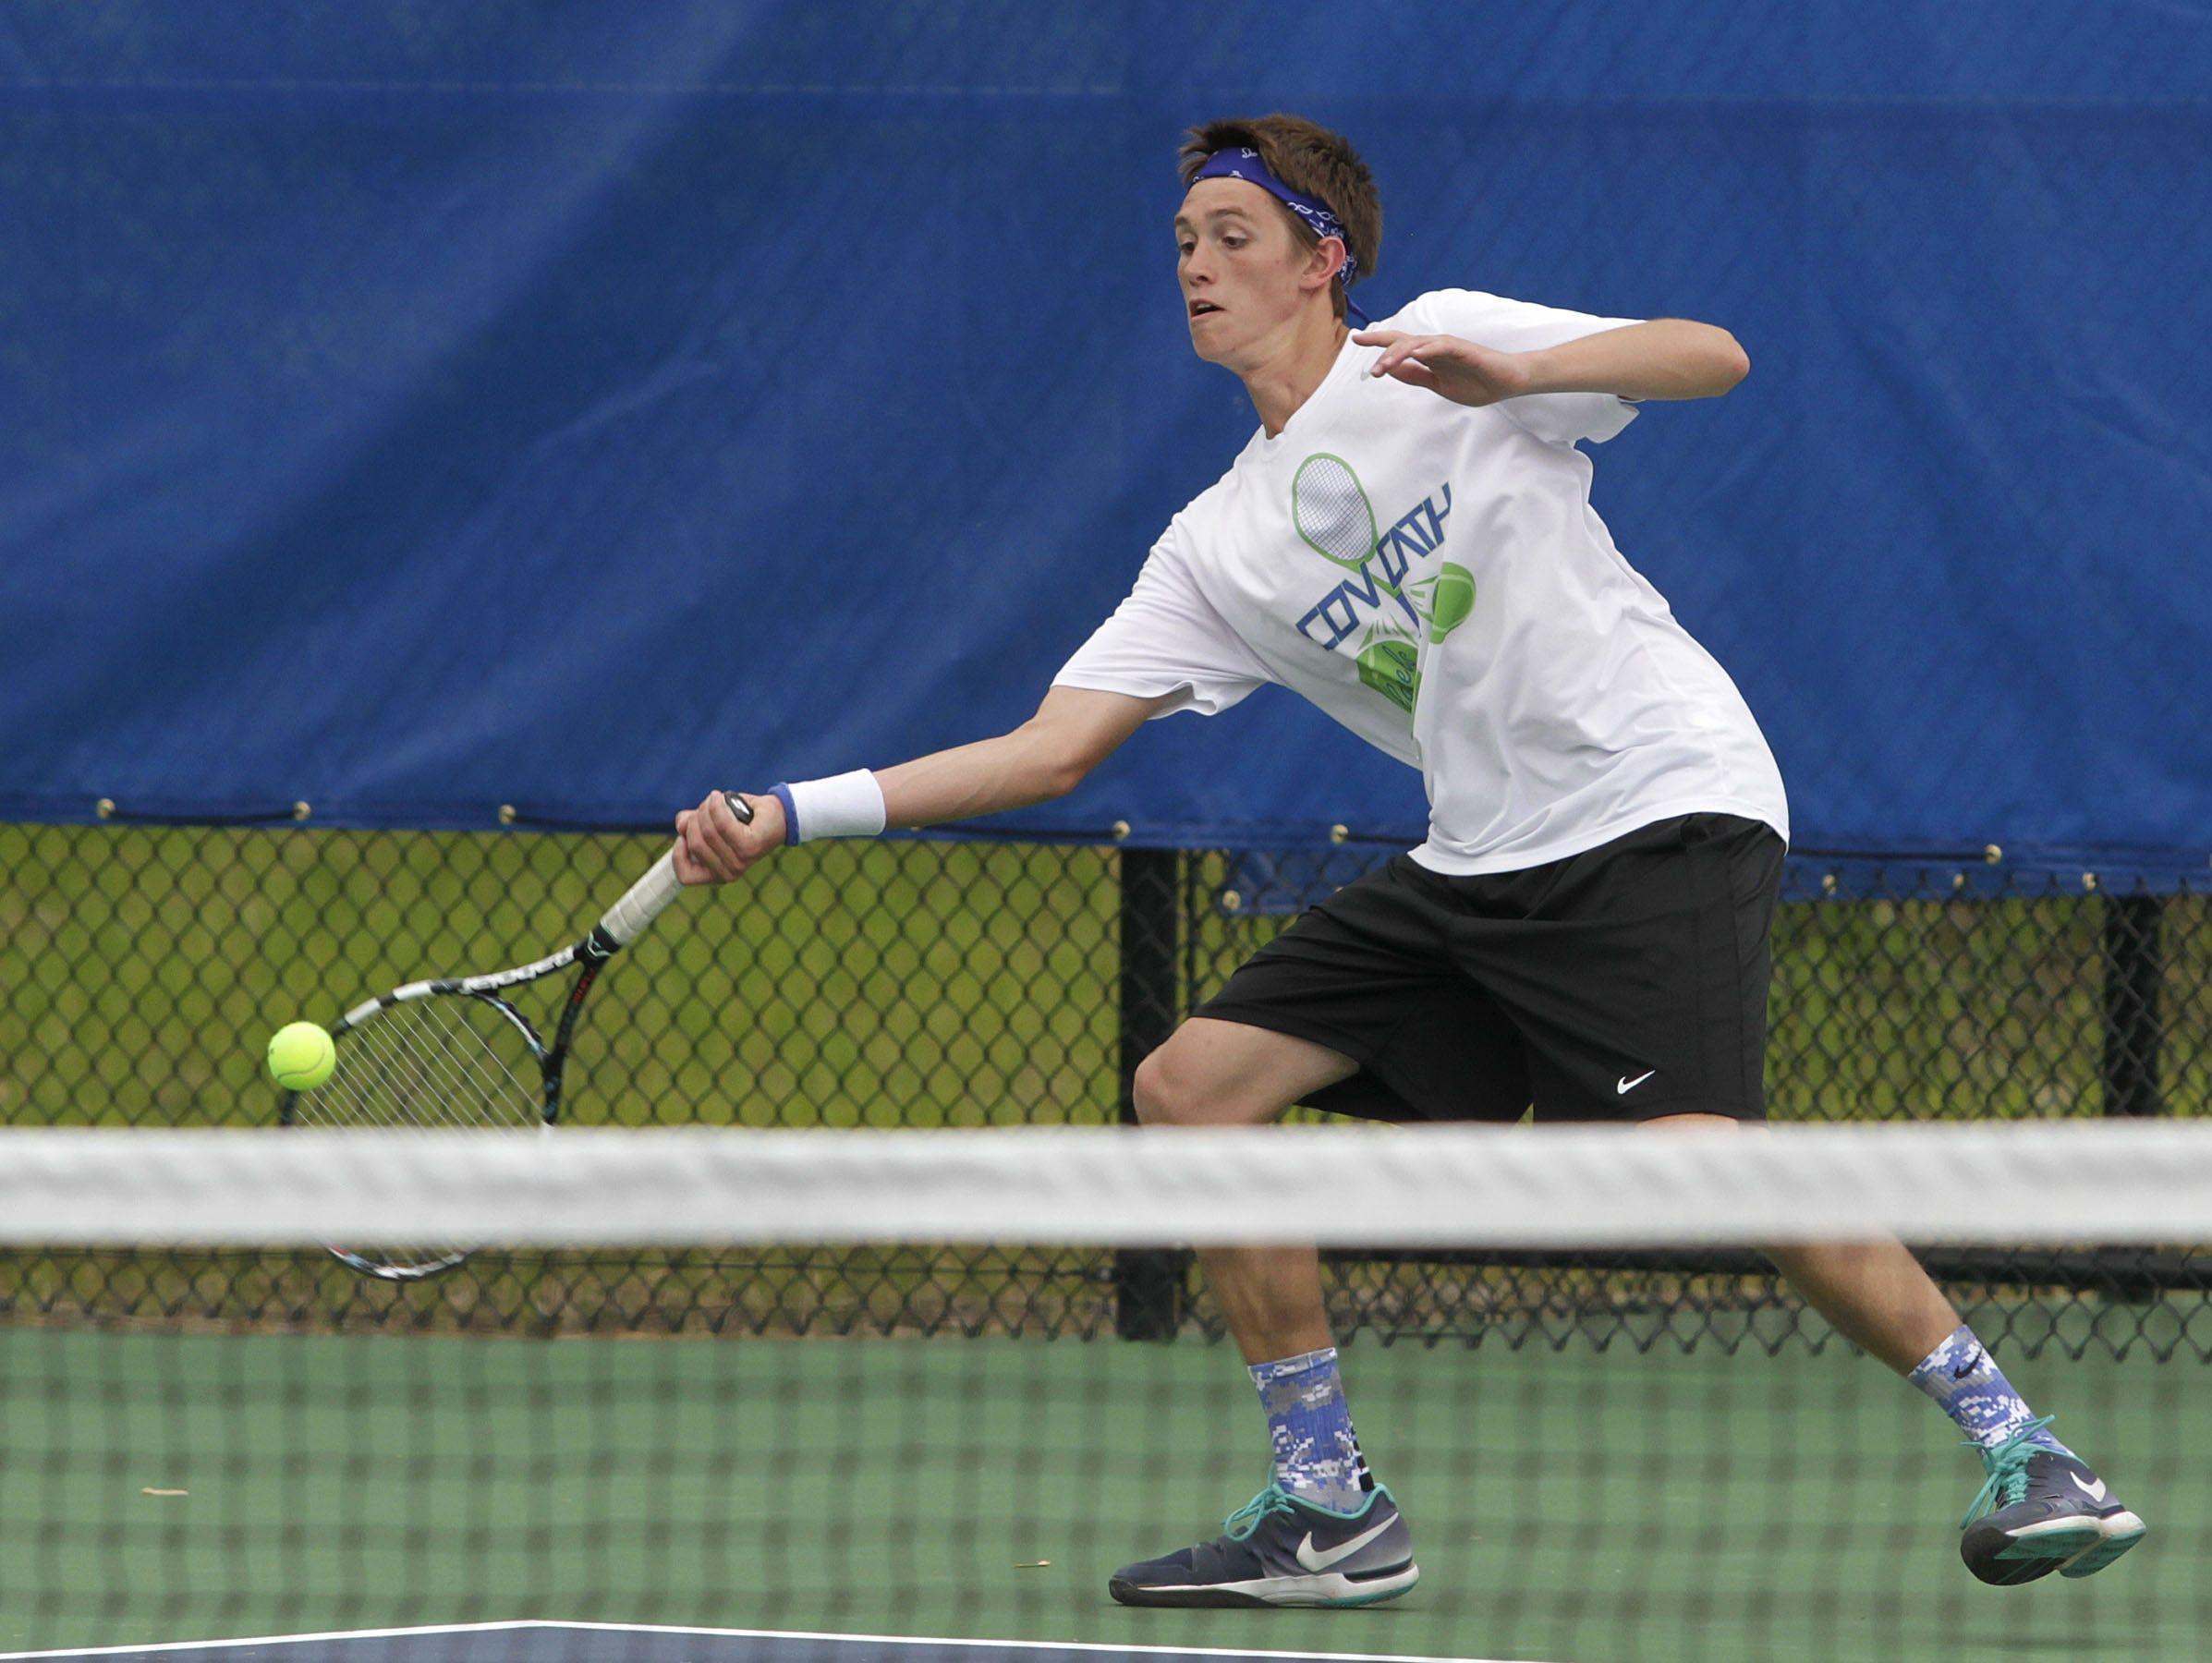 Covington Catholic's Austin Hussey won his fourth straight regional tennis title on Tuesday.